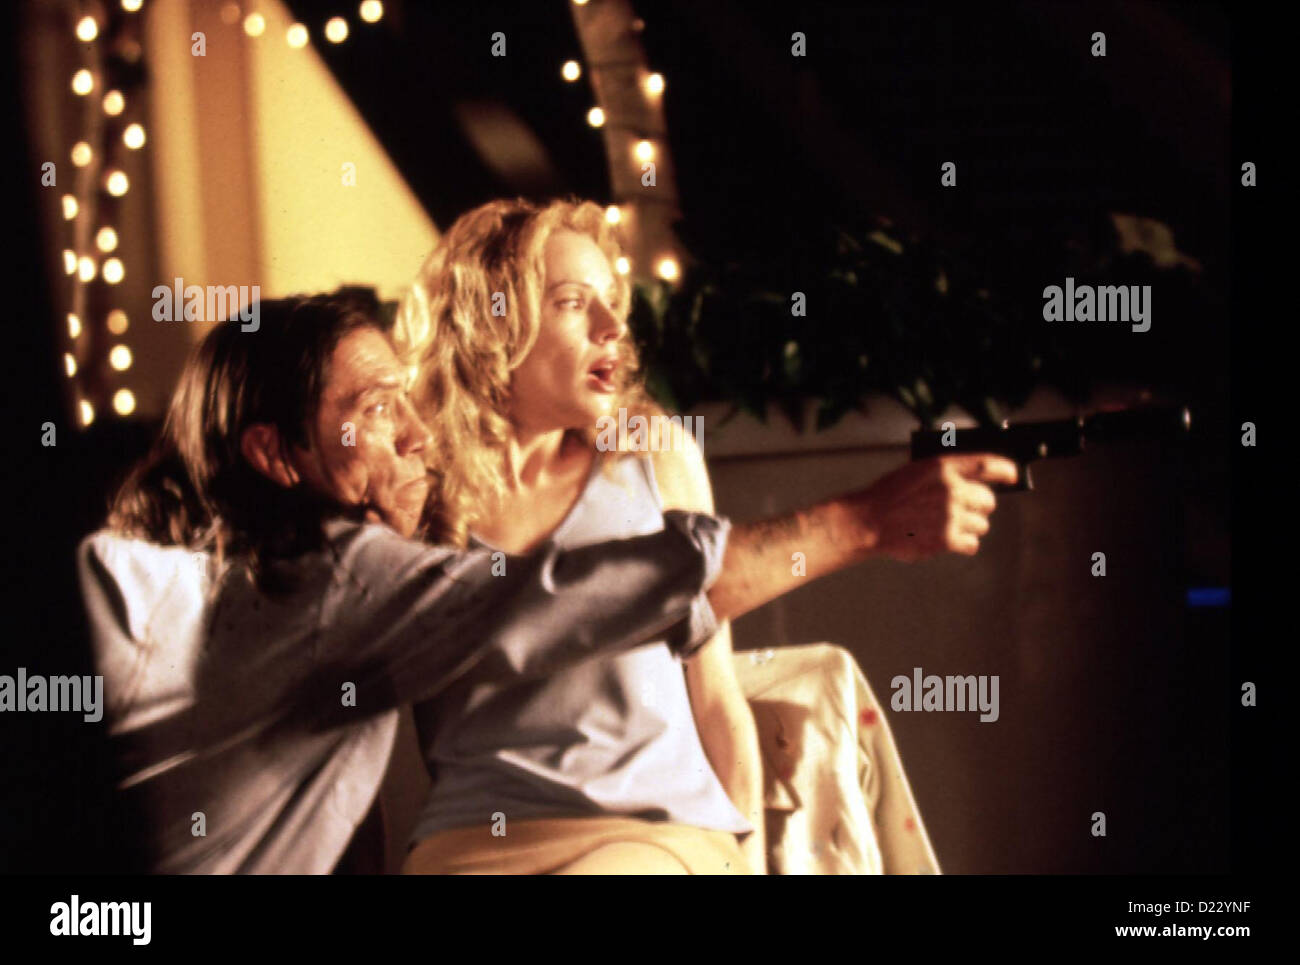 Point Blank - Plus de Point Blank Danny Trejo, Nina Savelle